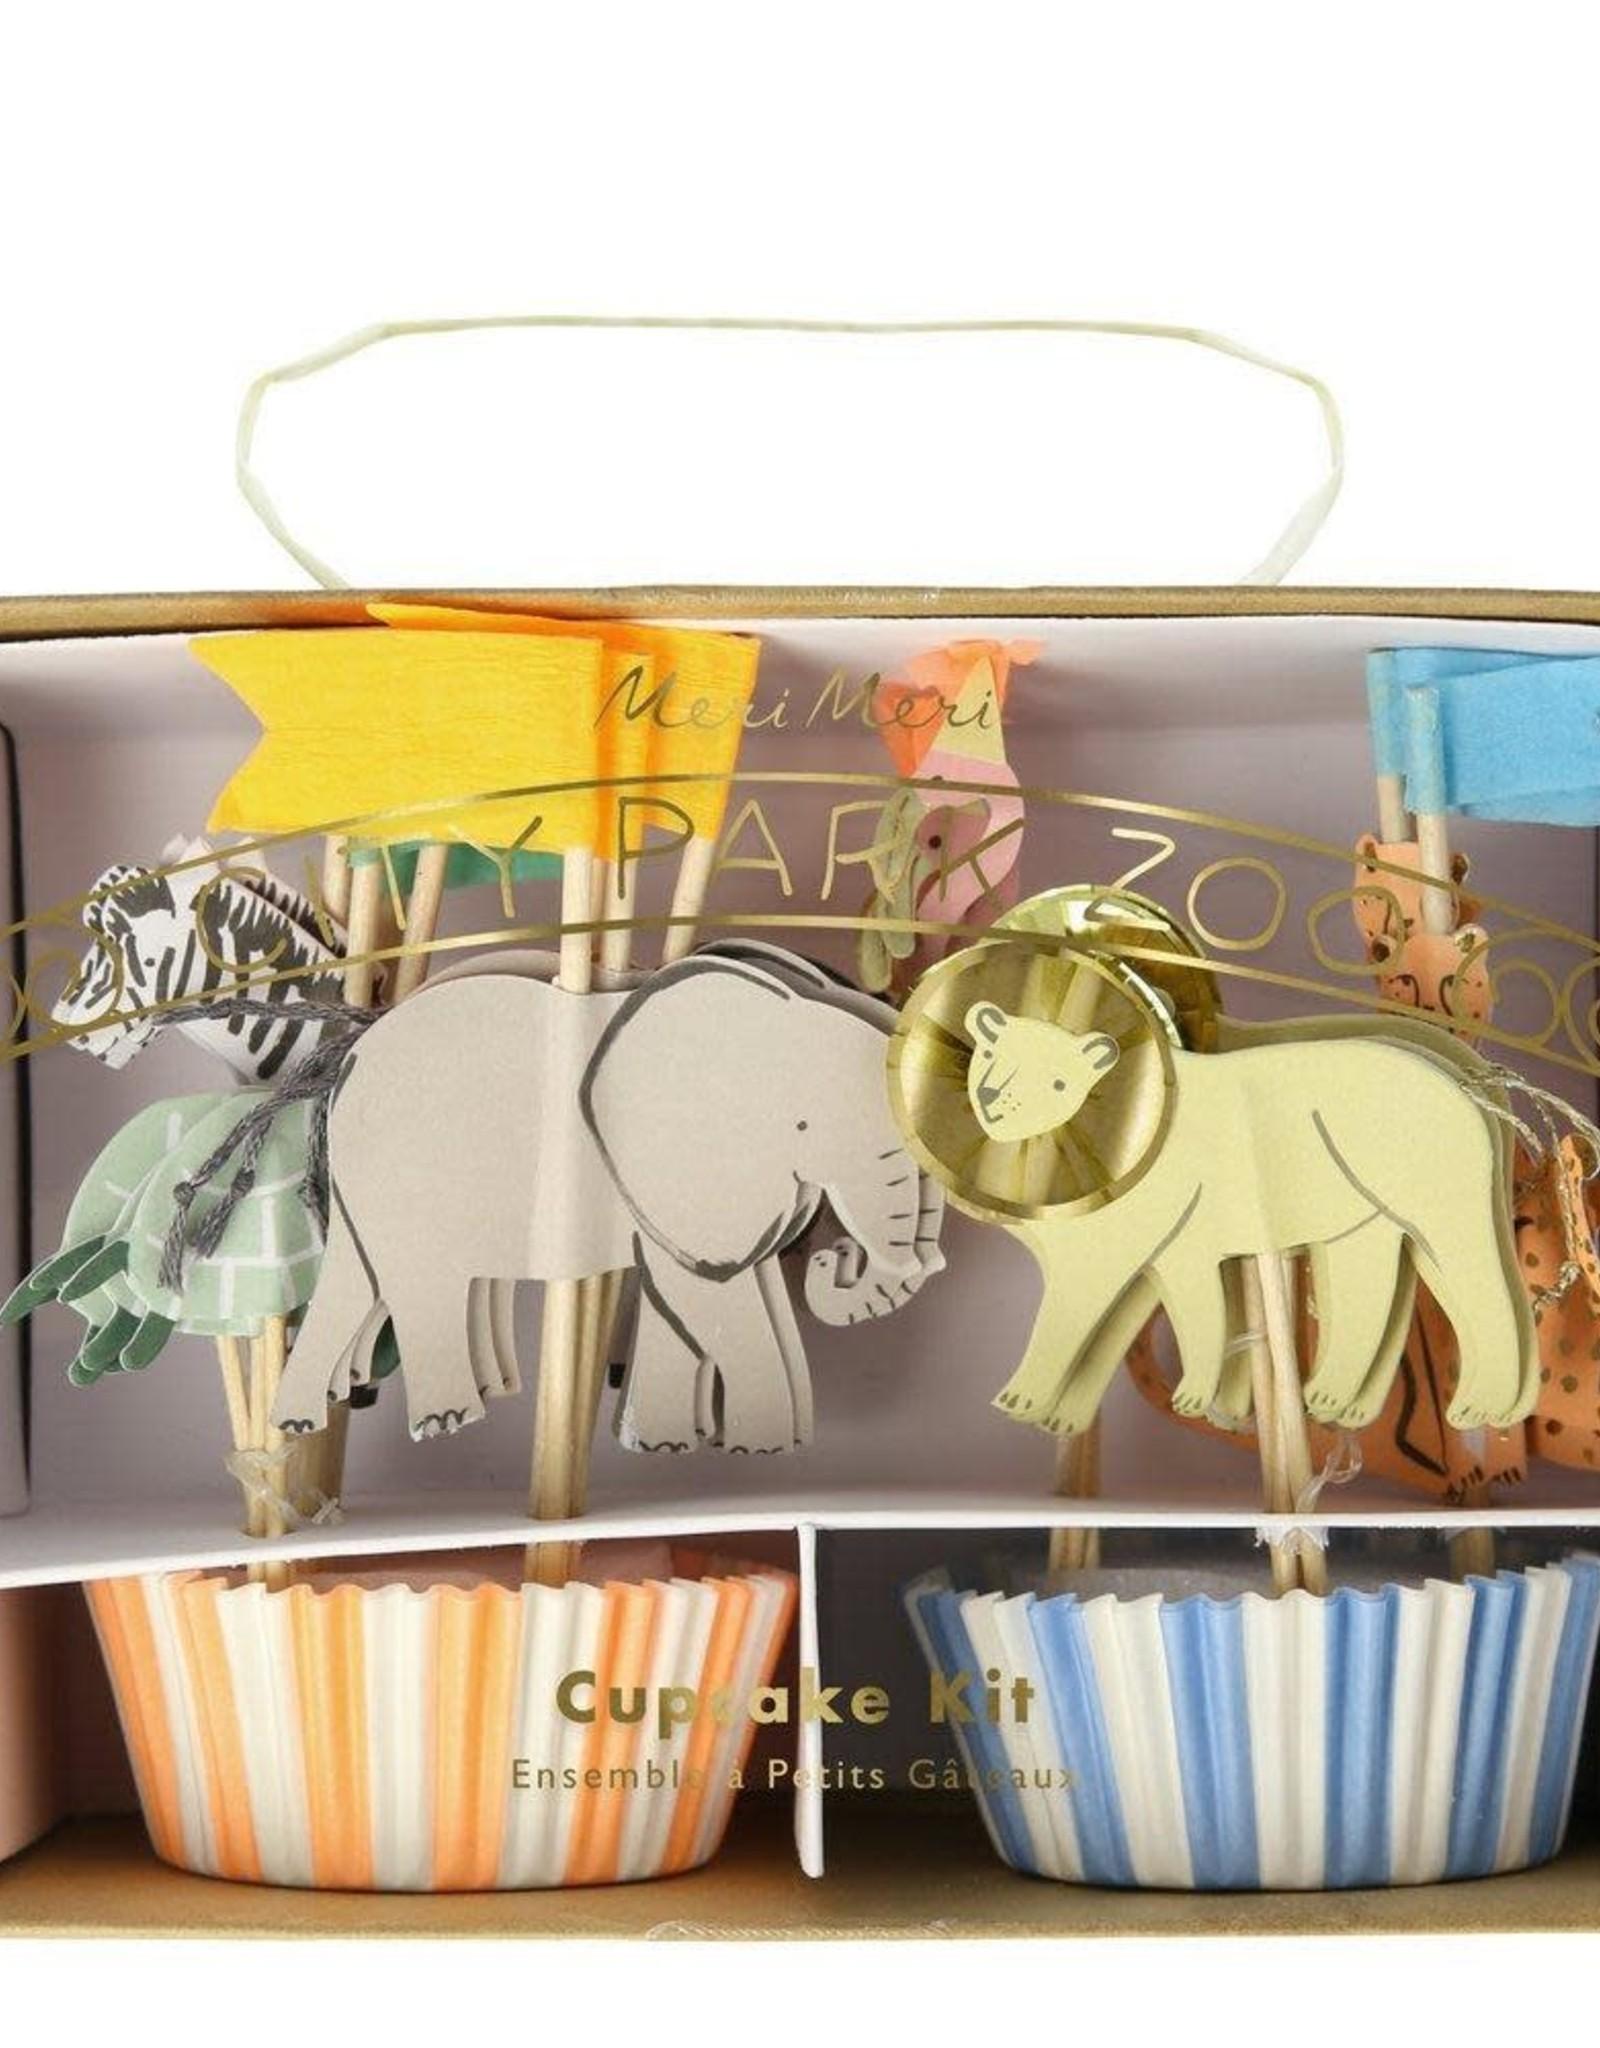 Meri Meri safari animals cupcake kit